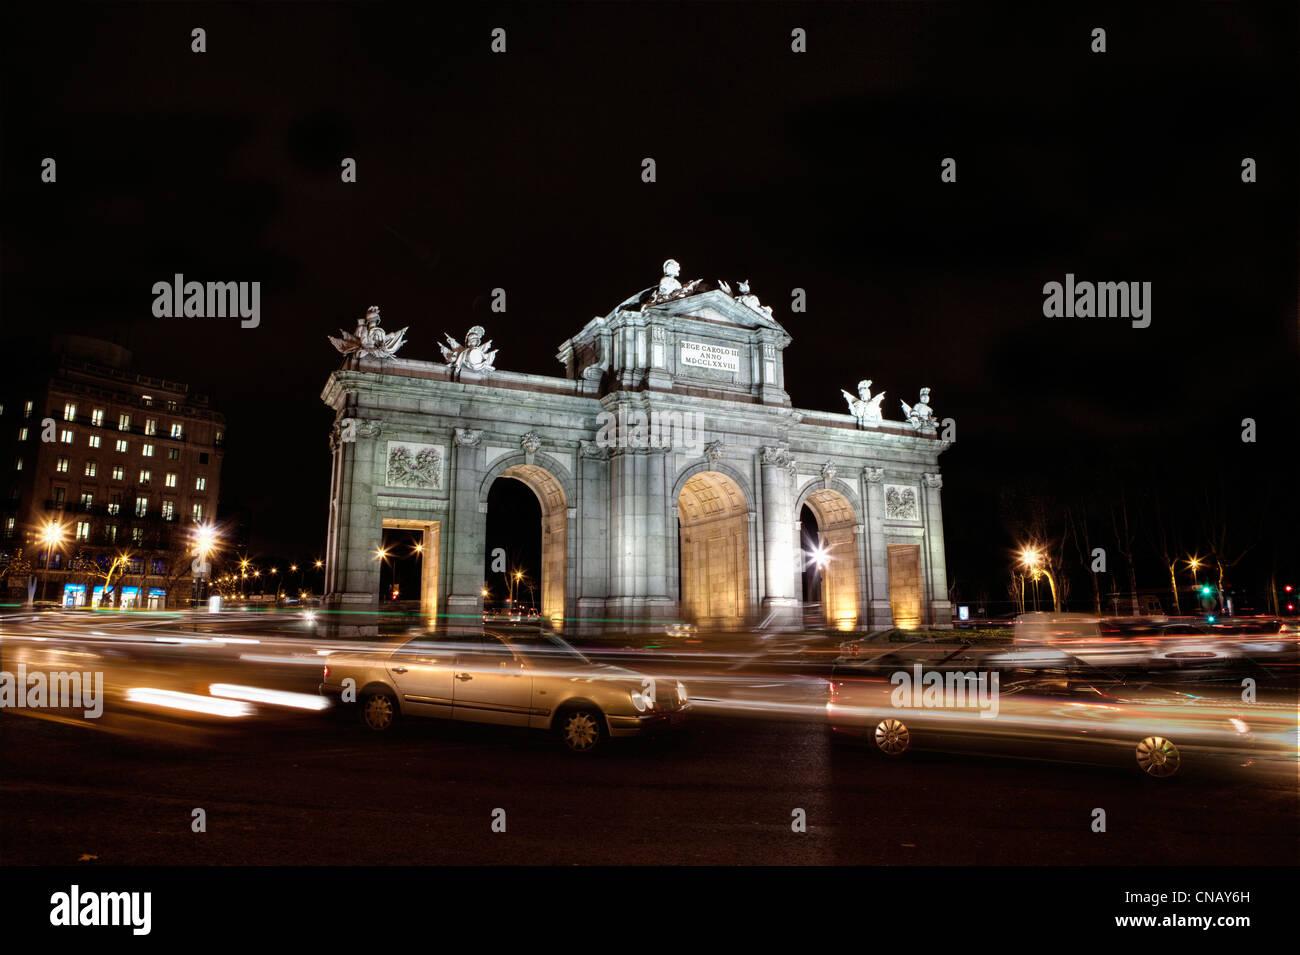 Puerta de Alcala lit up at night - Stock Image